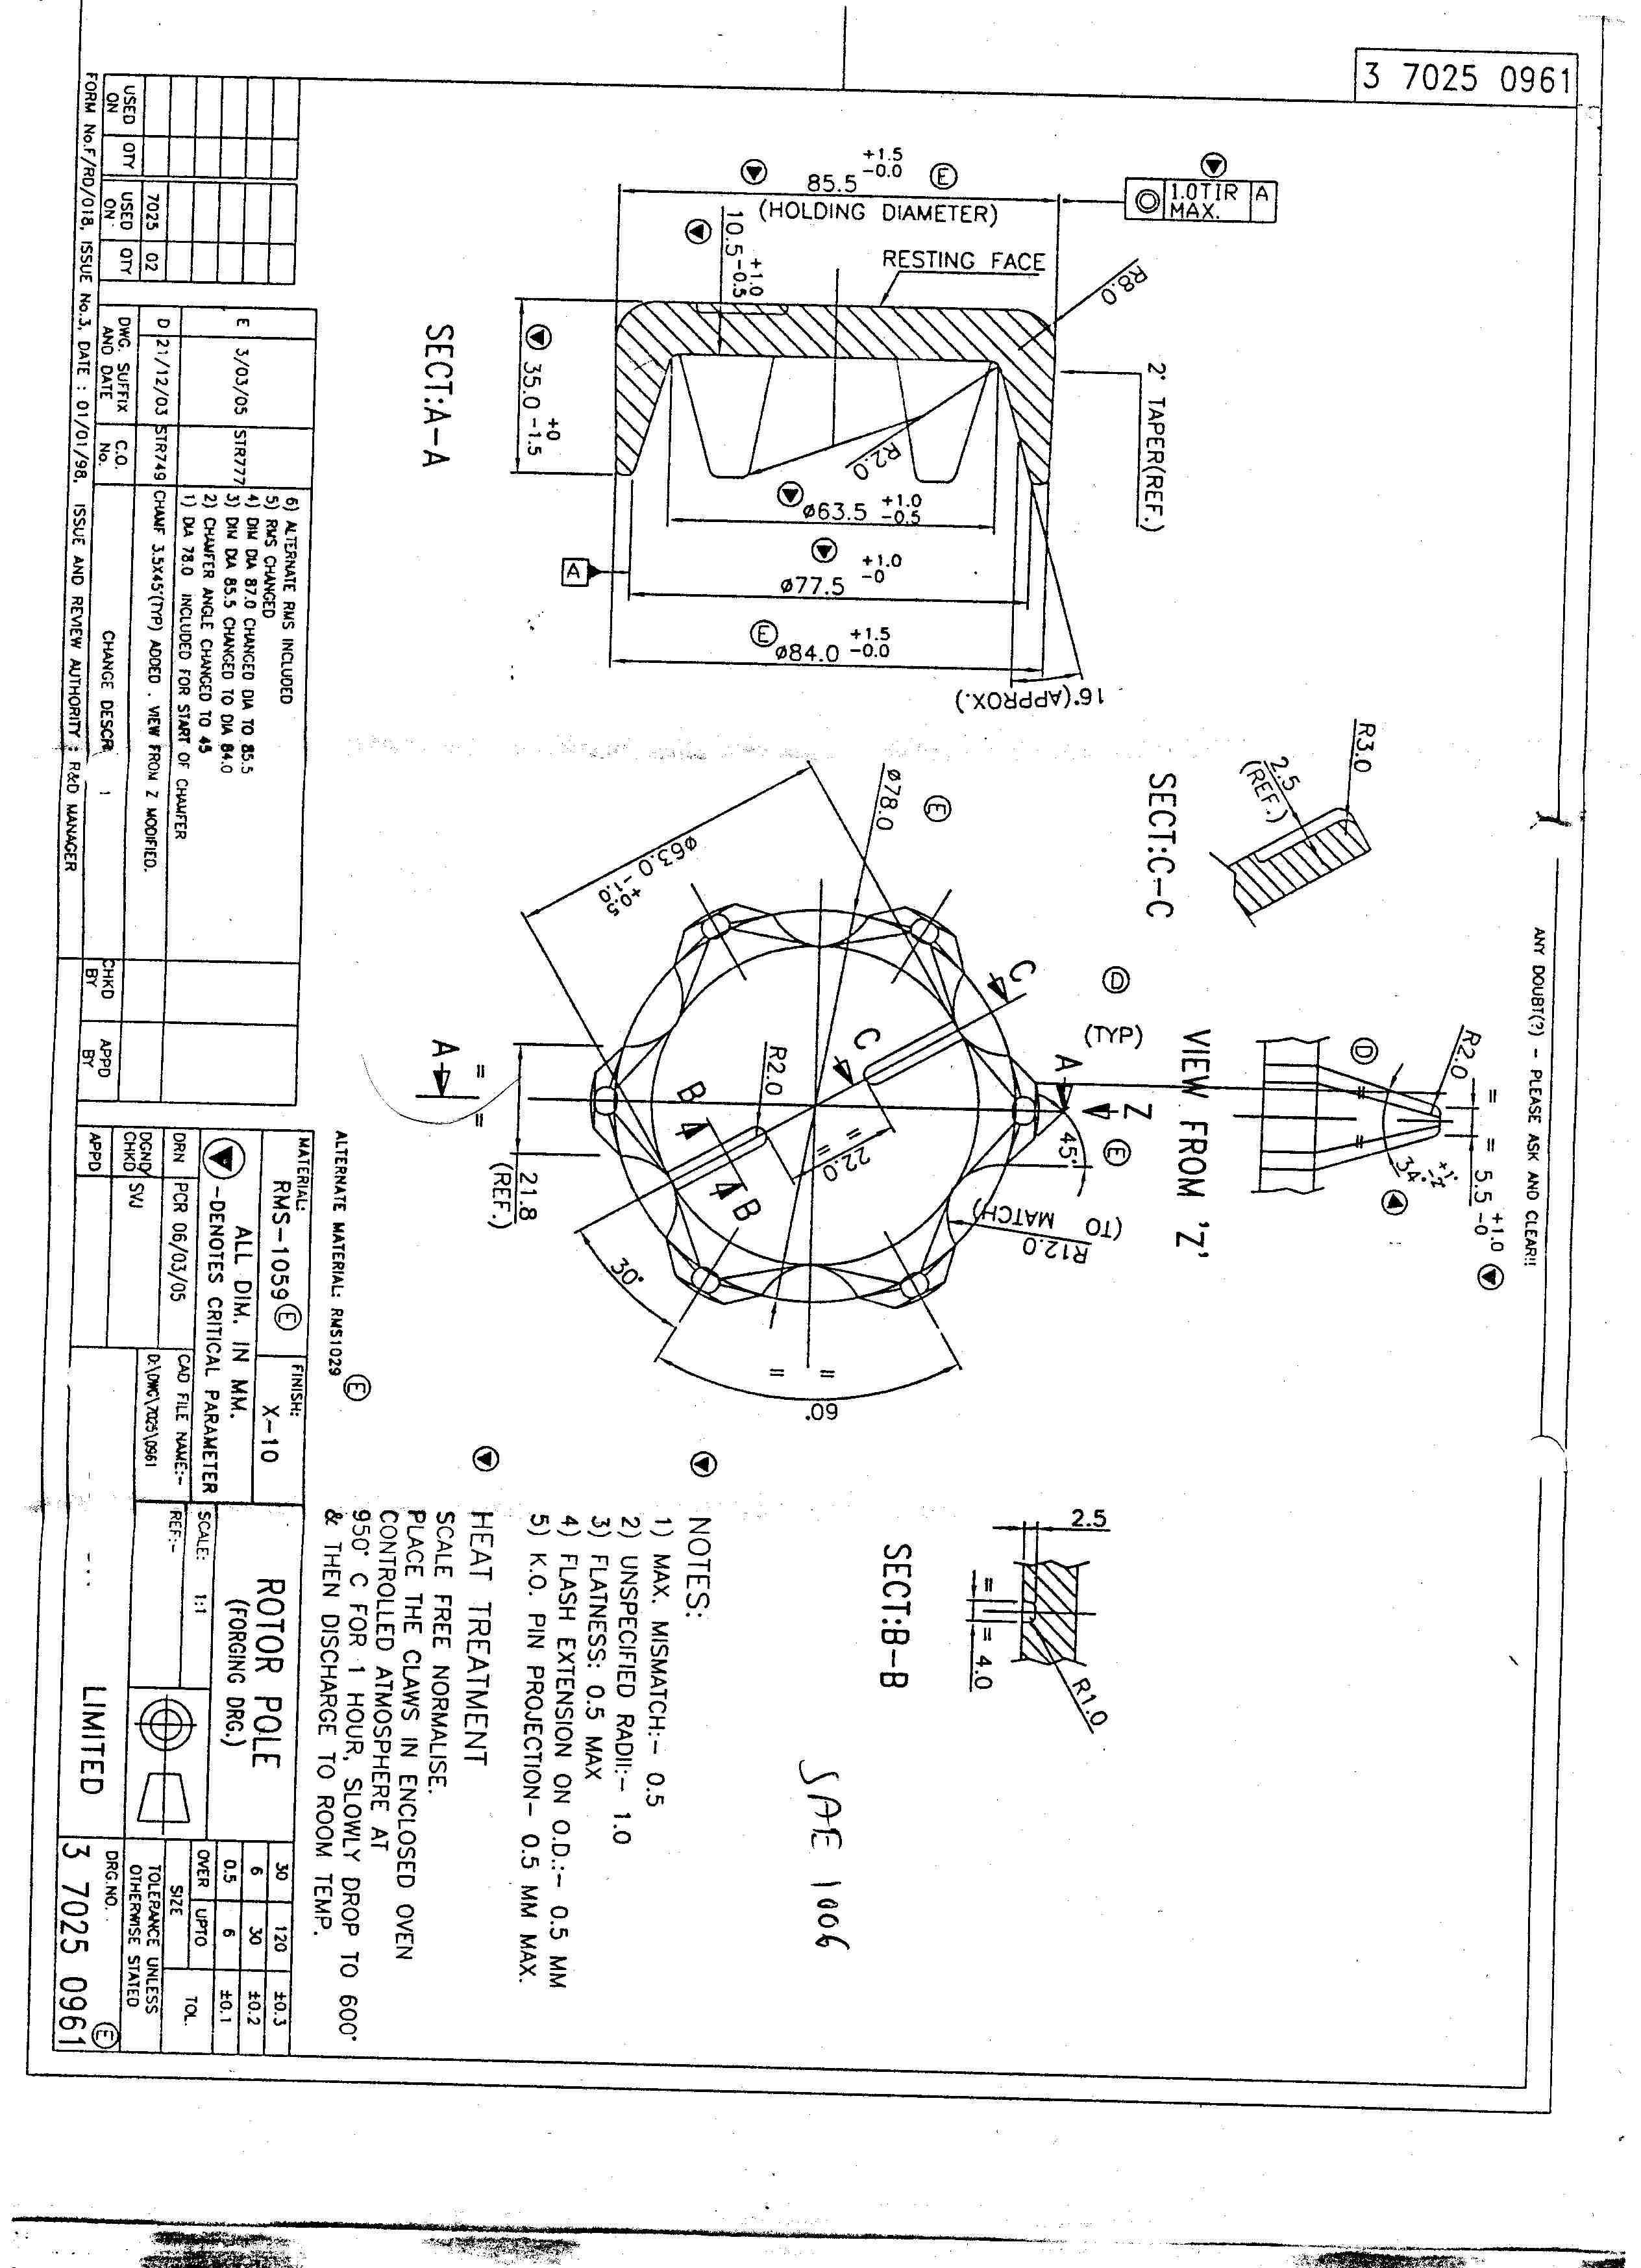 rotor pole